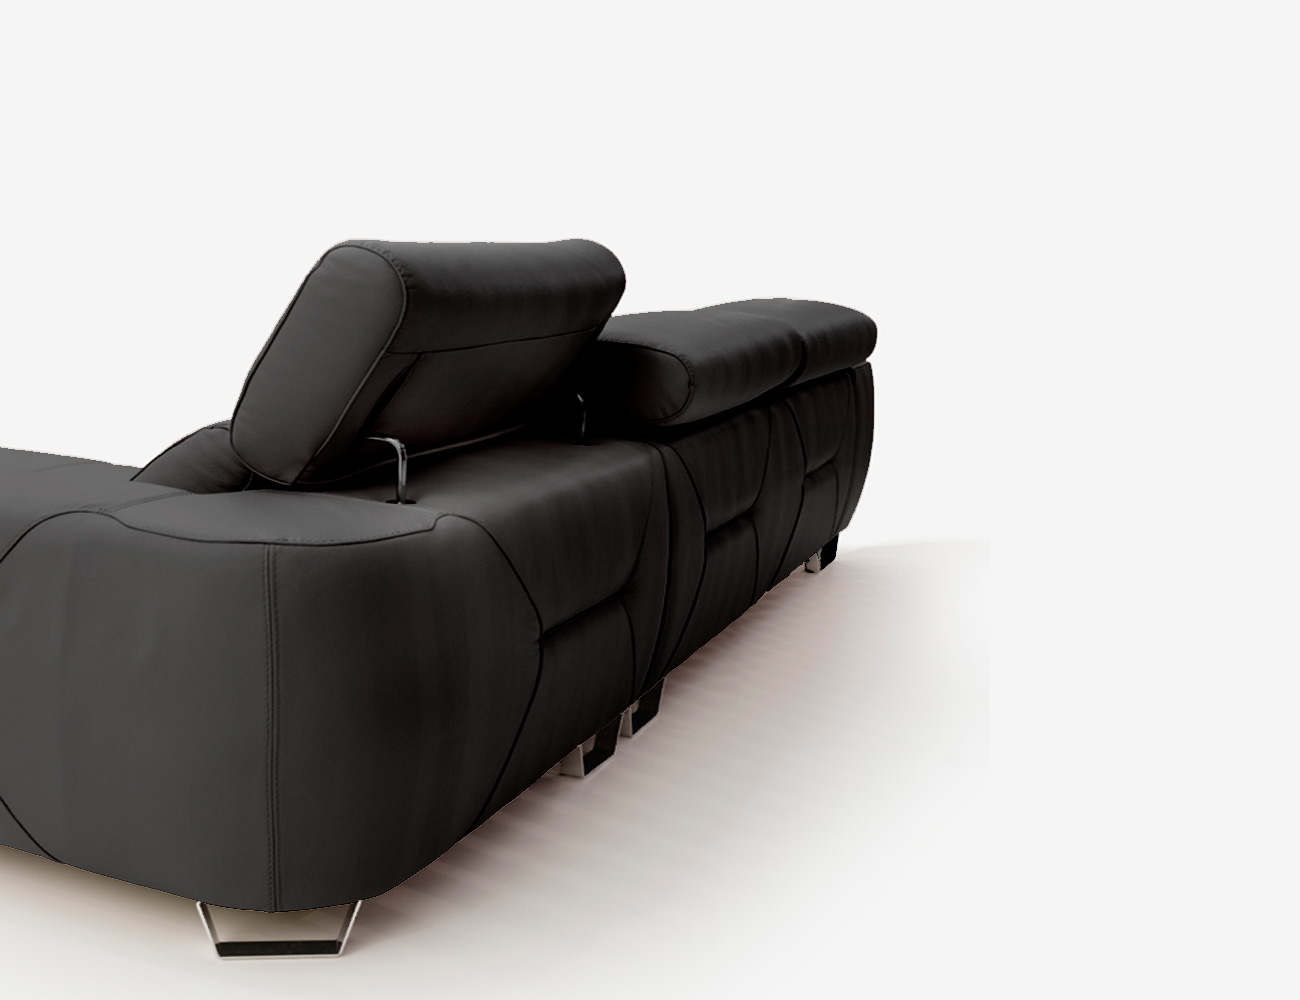 Sofa chaiselongue pedro ortiz piel espesorada antracita 2